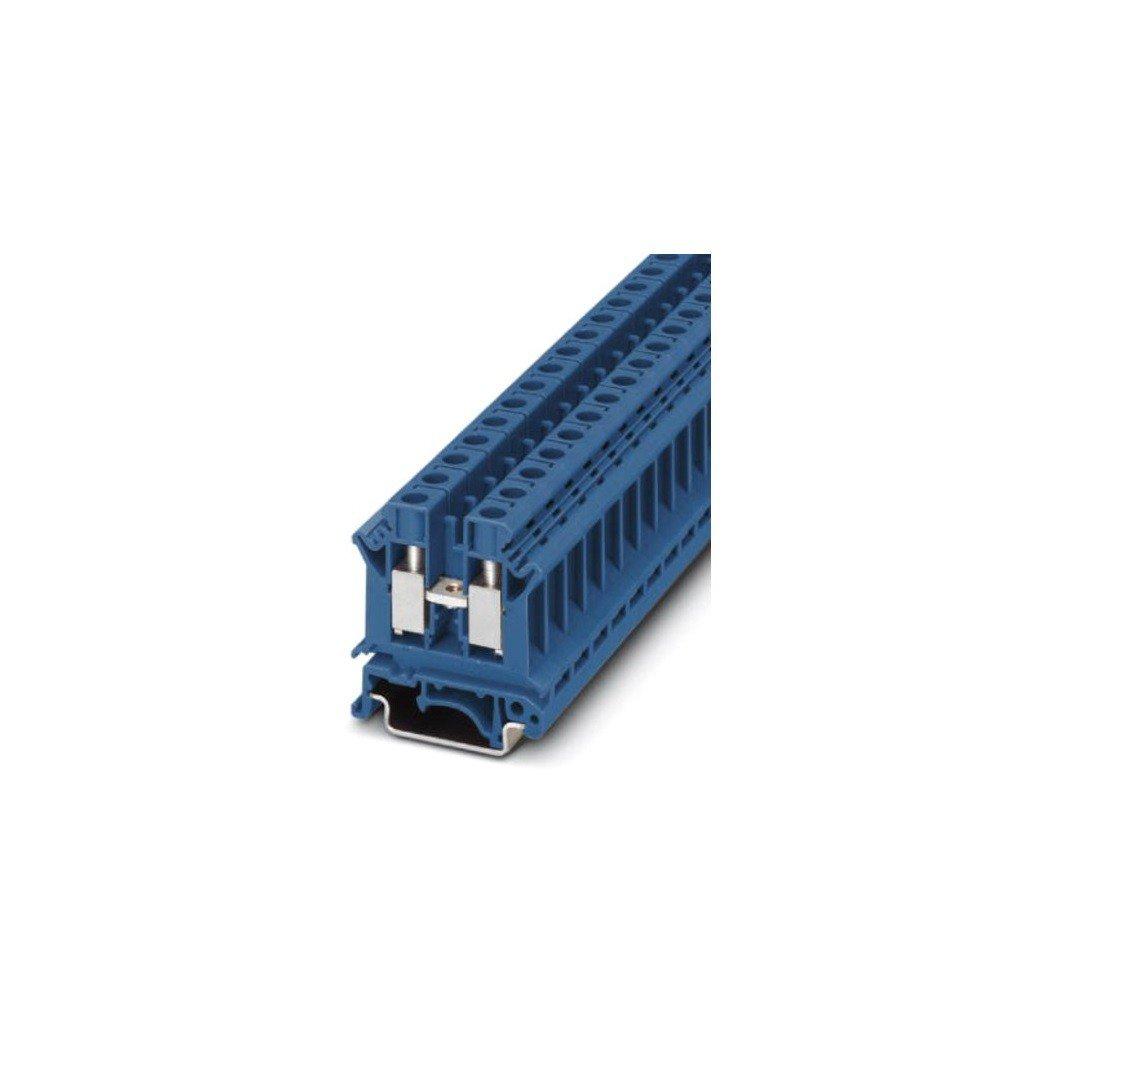 Bloc de jonction simple Contenu s 50 pc Phoenix Contact UK 10 N BU 3005086